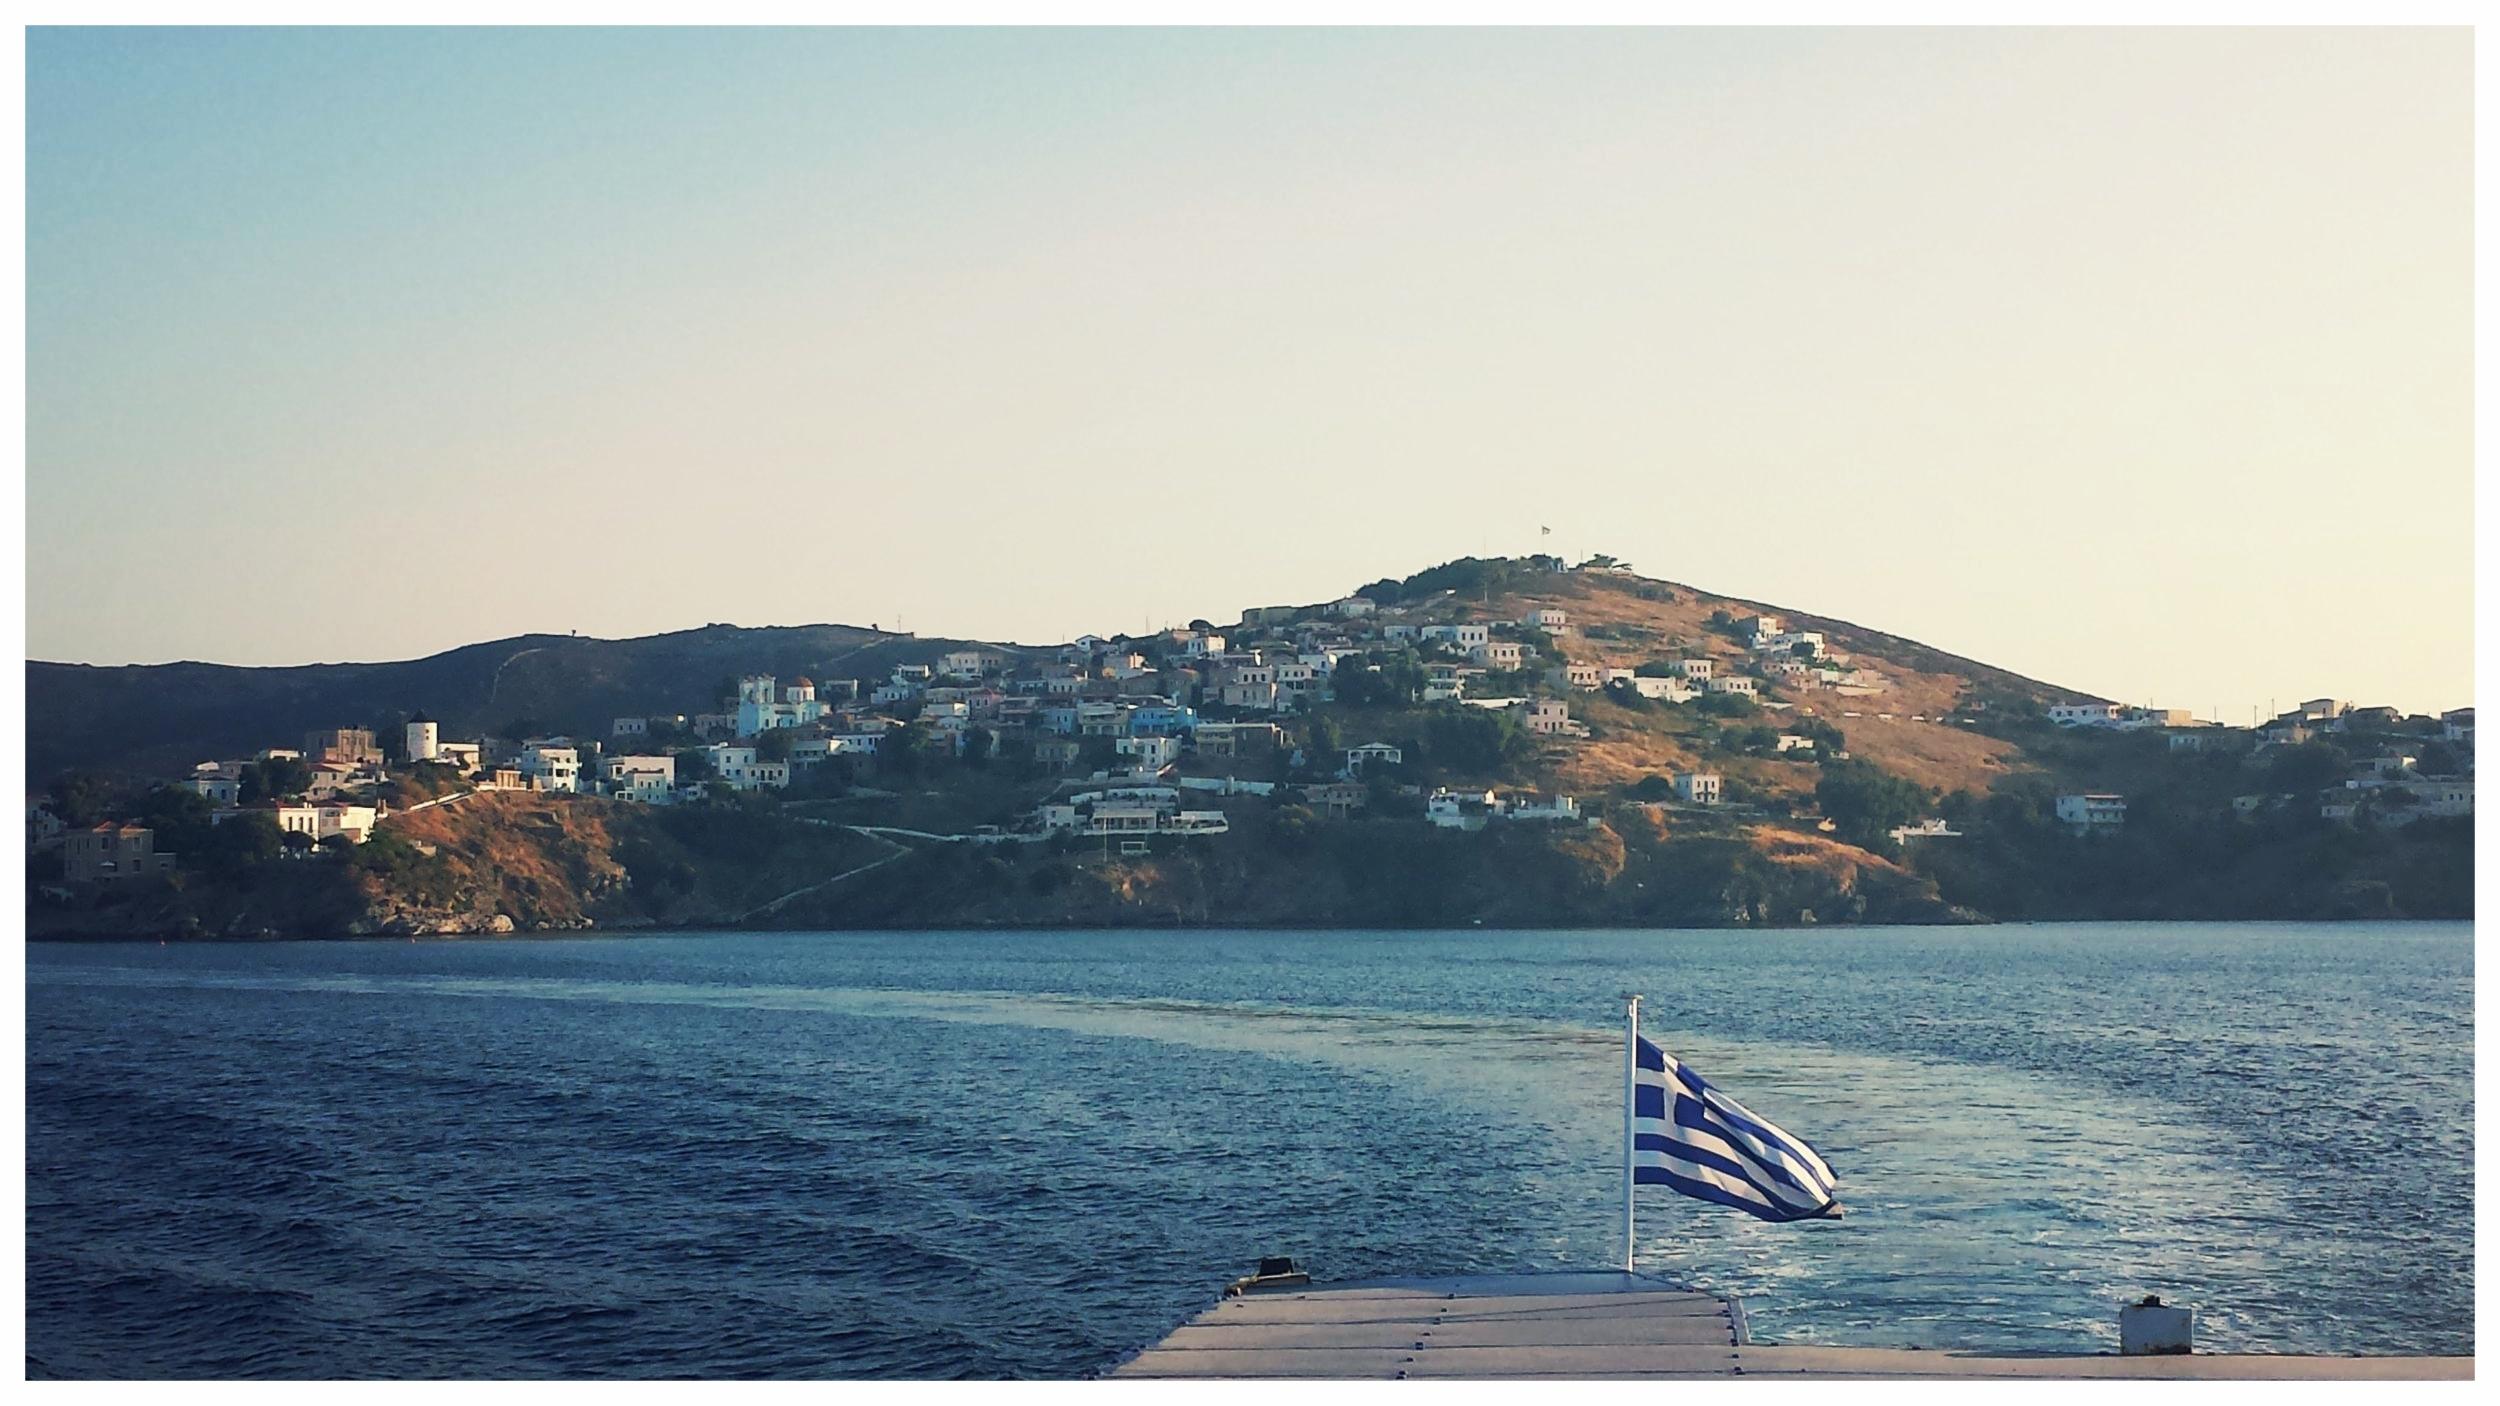 Ferry leaving the island. Yiassou!